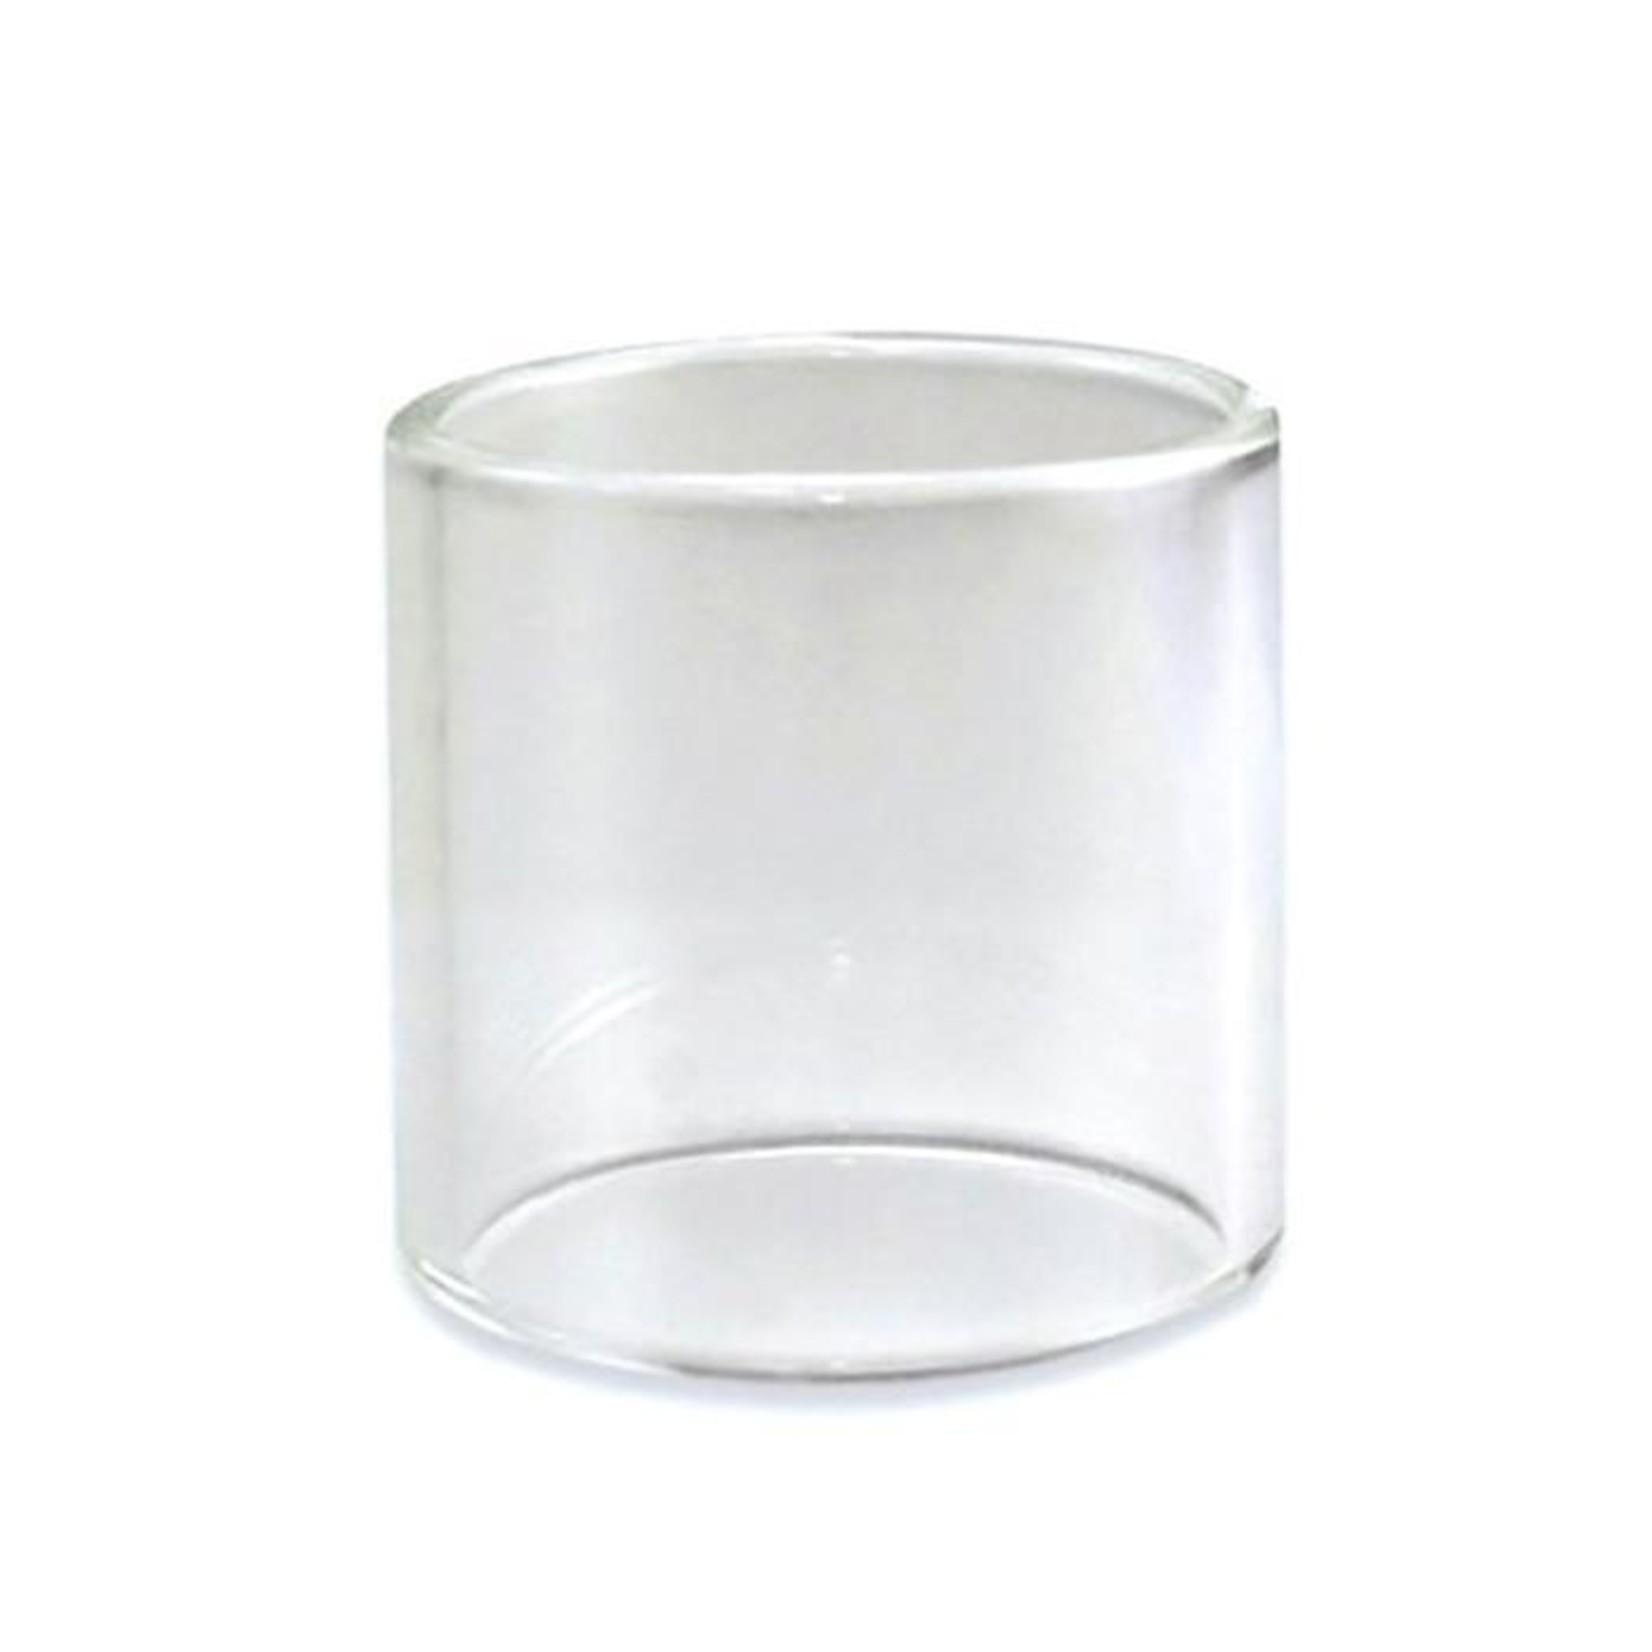 Horizon Tech Arco 2 Replacement Glass